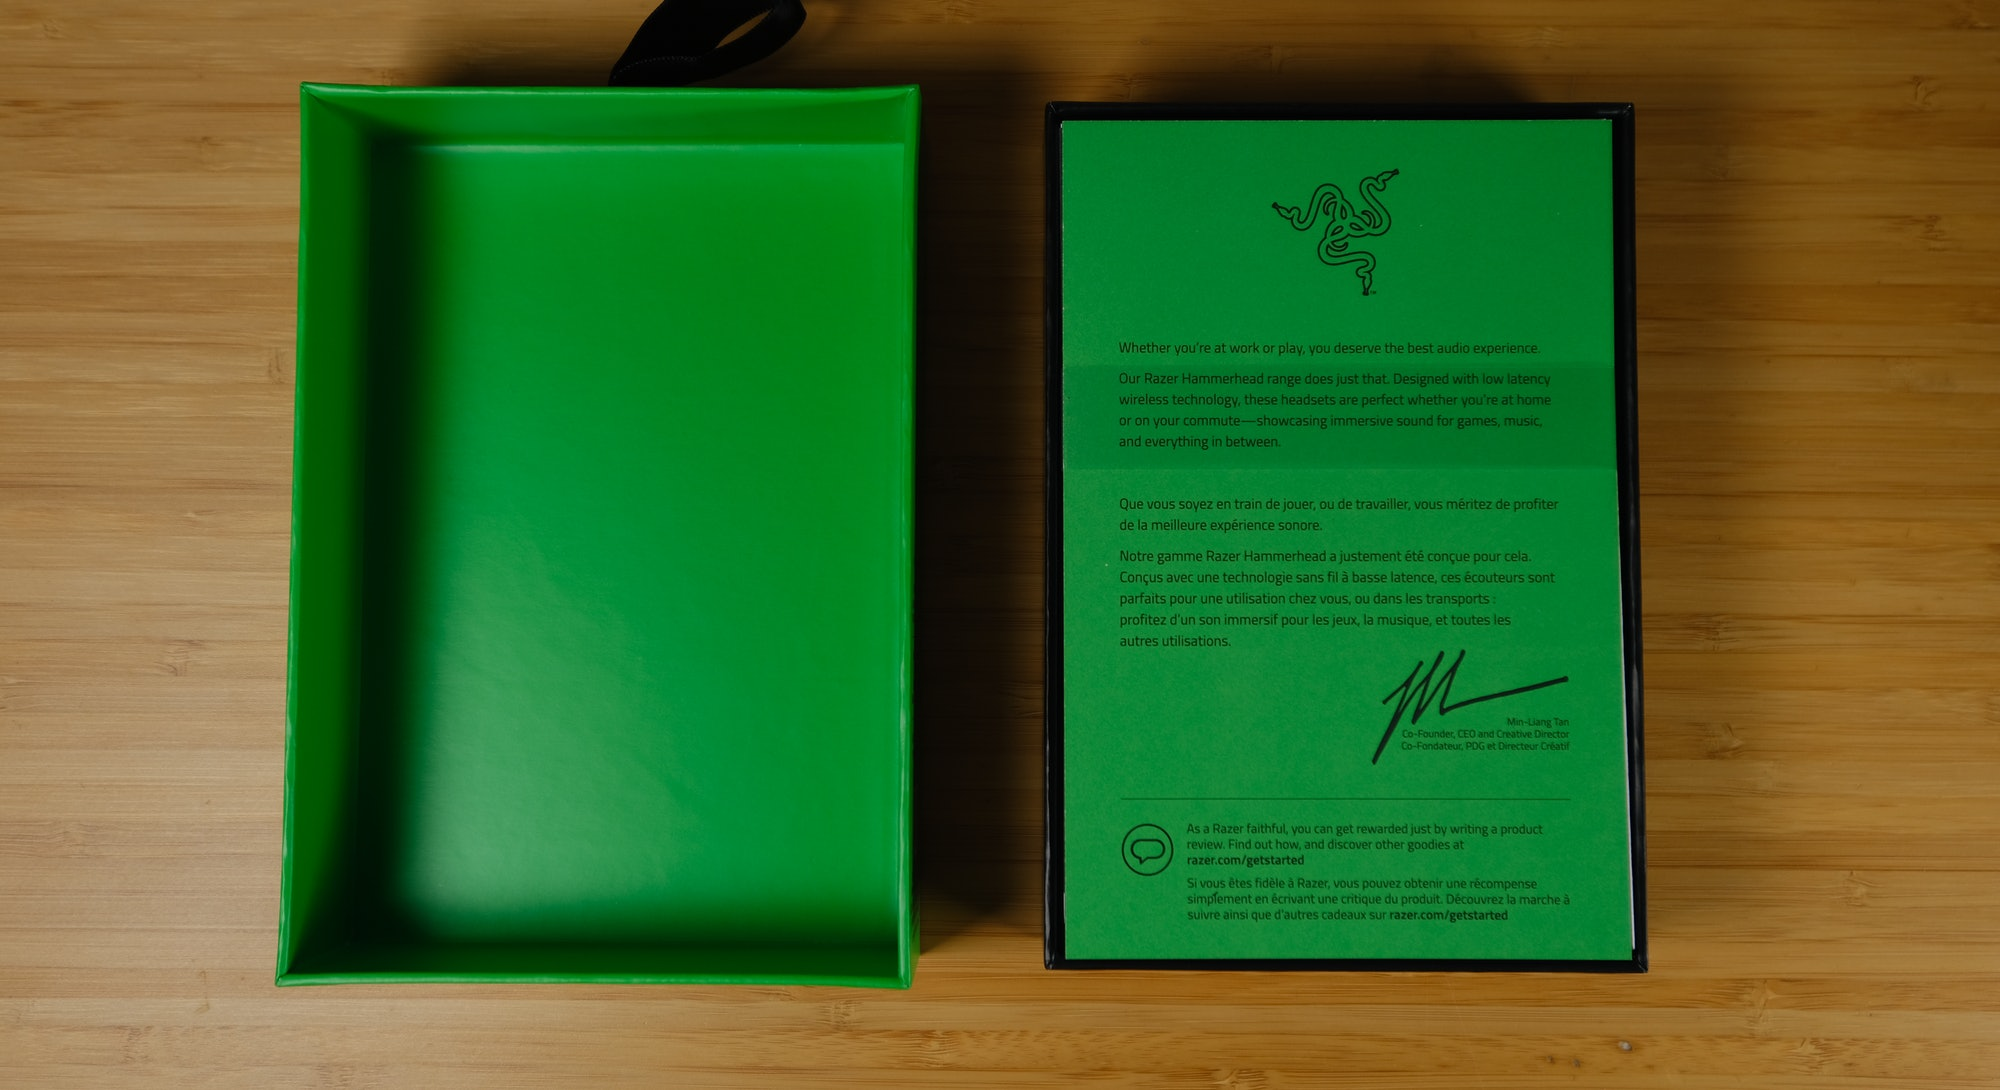 Box containing the Razer Hammerhead Pro earbuds